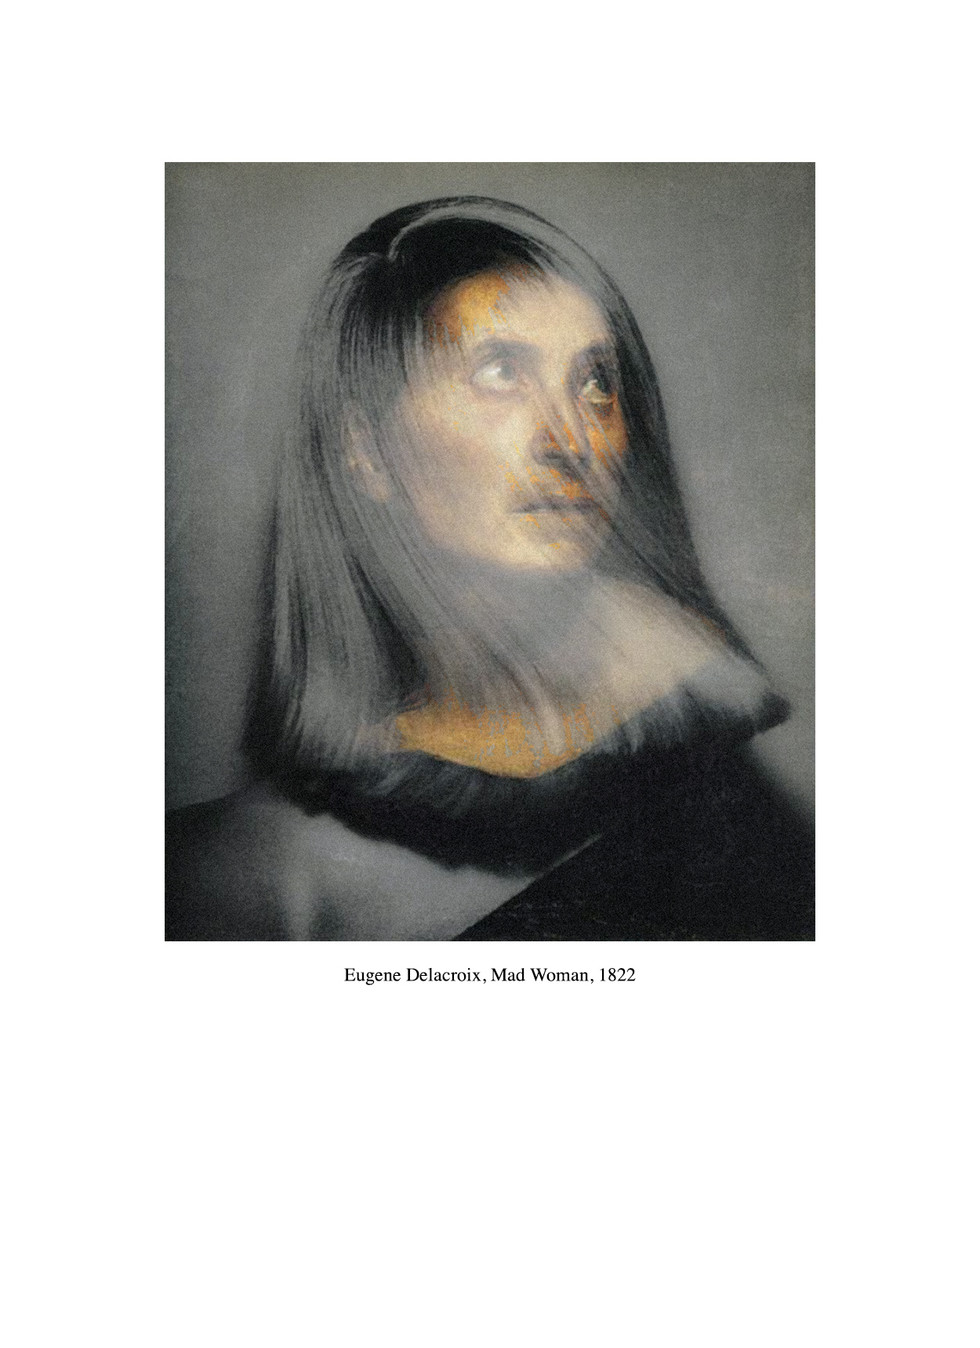 Dana-Darvish_Eugene-Delacroix,-Mad-Woman